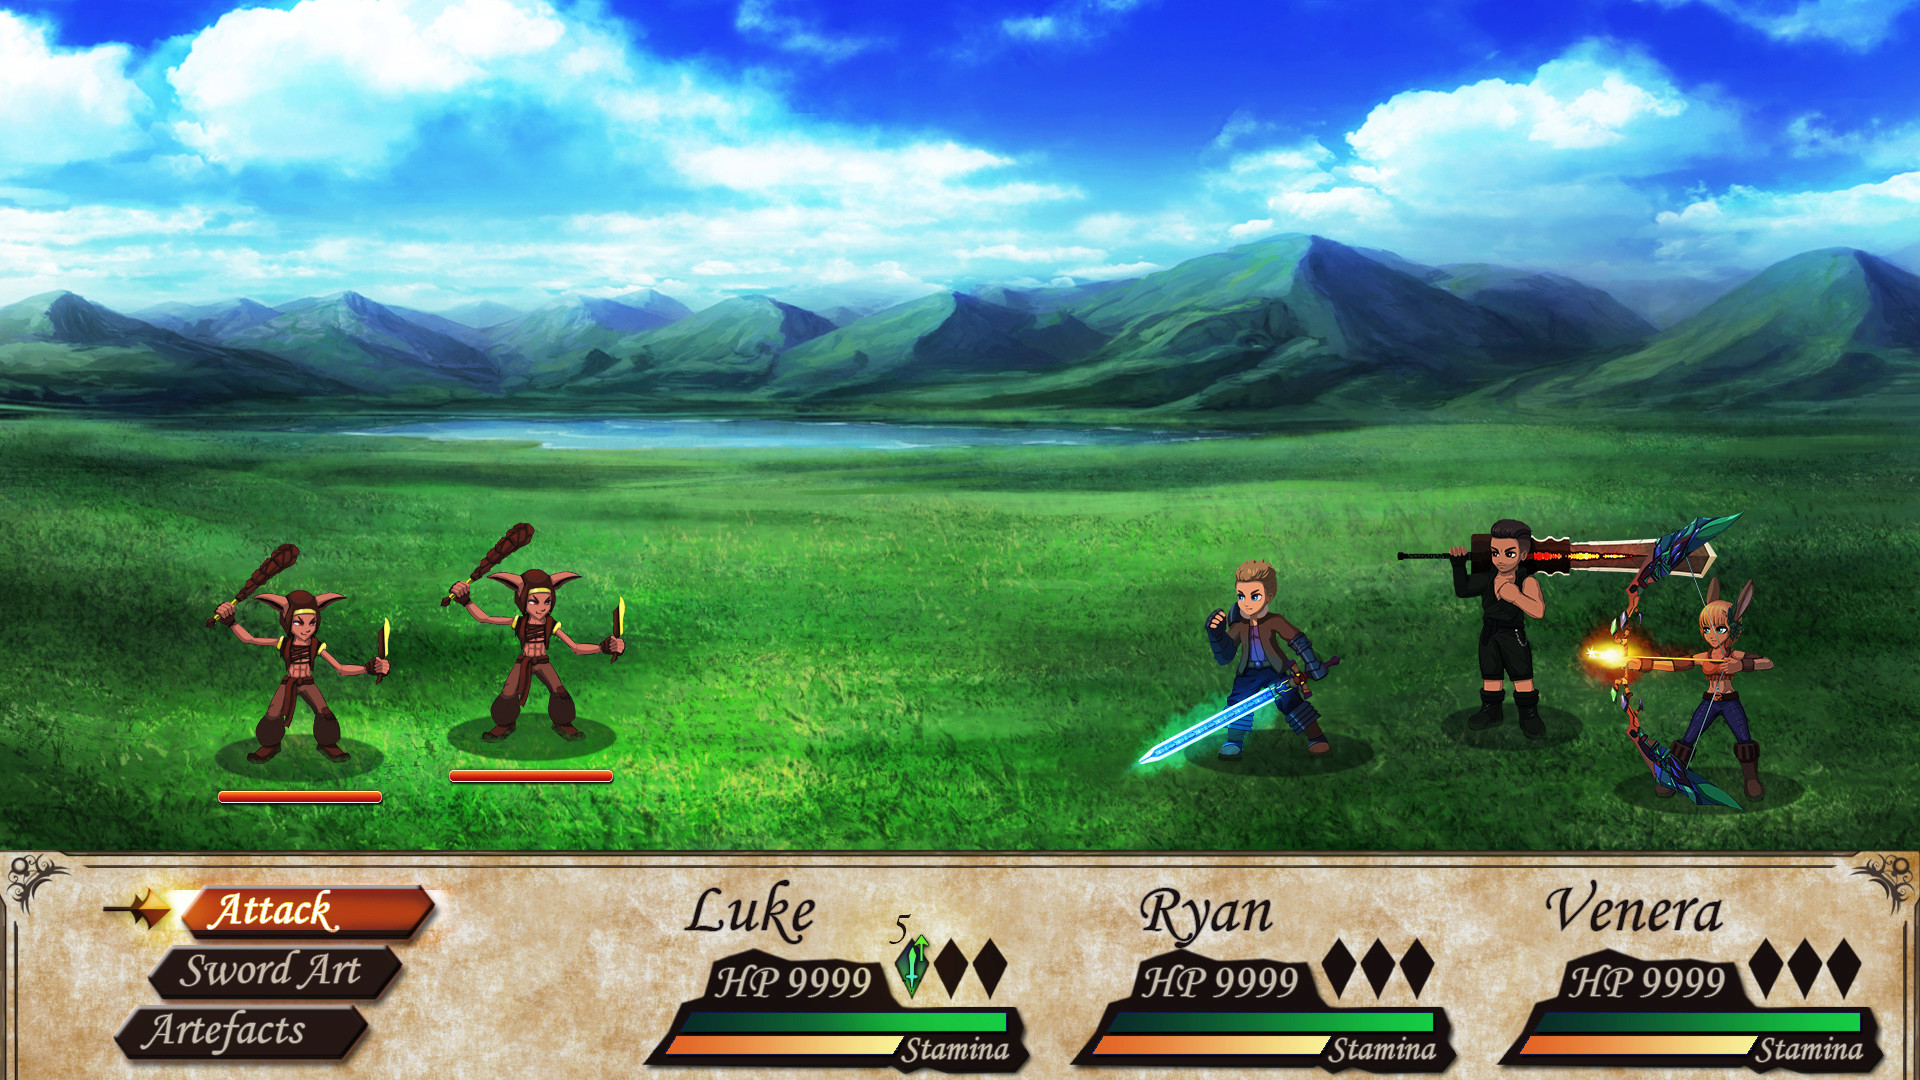 ArtStation - Battle System UI for 2D Turn-Based RPG Game